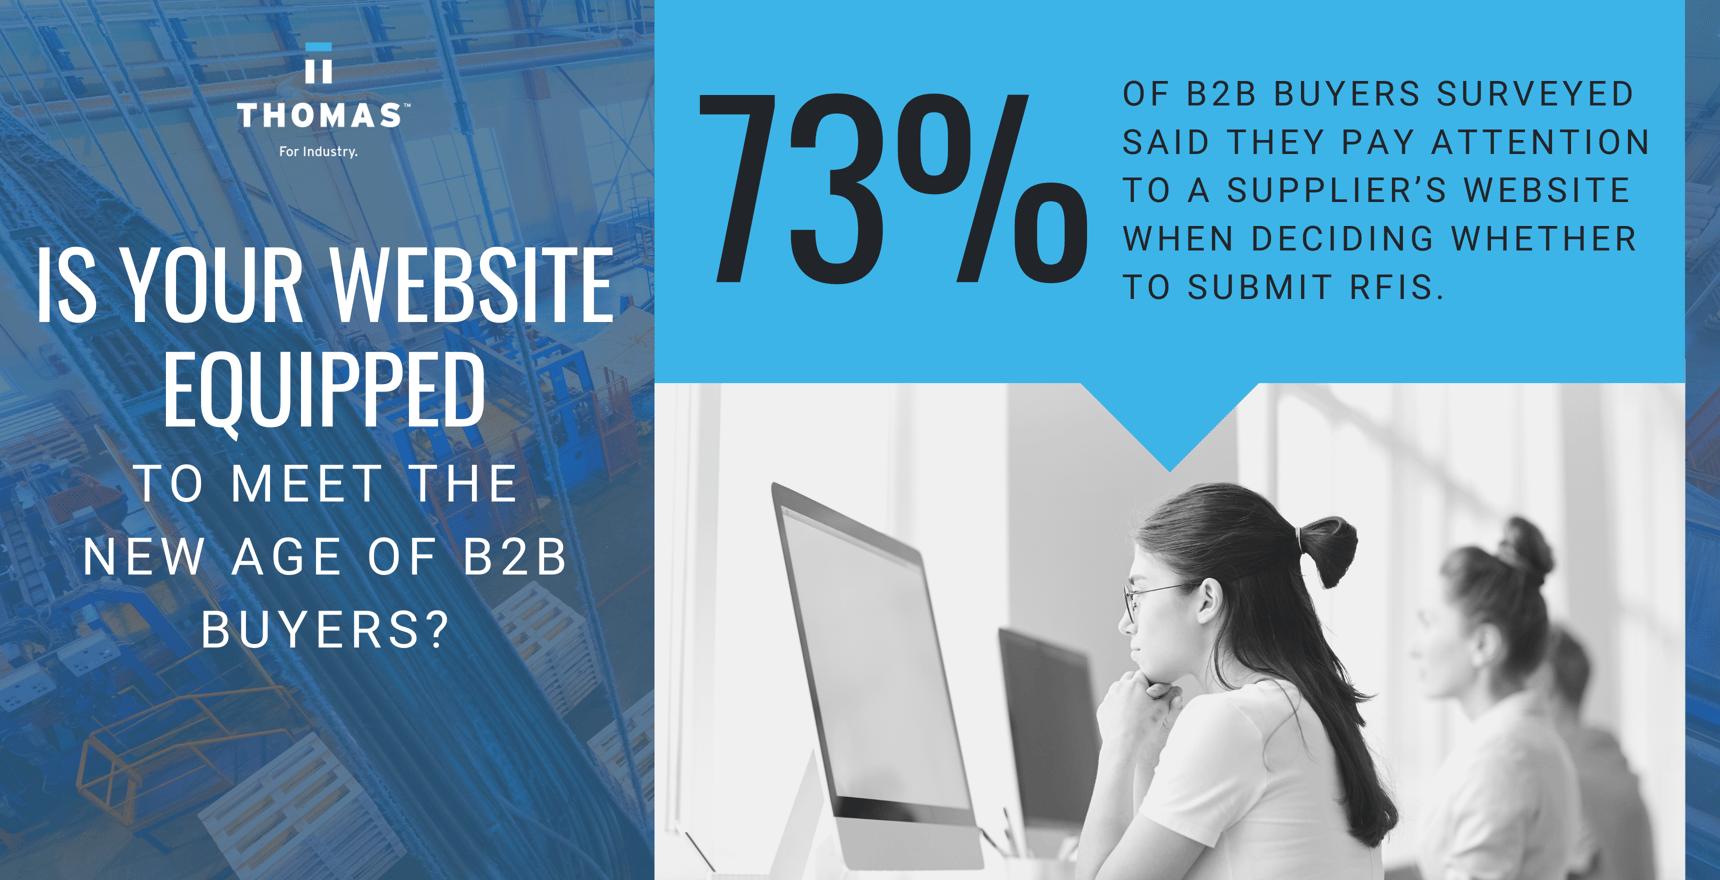 B2B Buyer Stats Infographic - Website